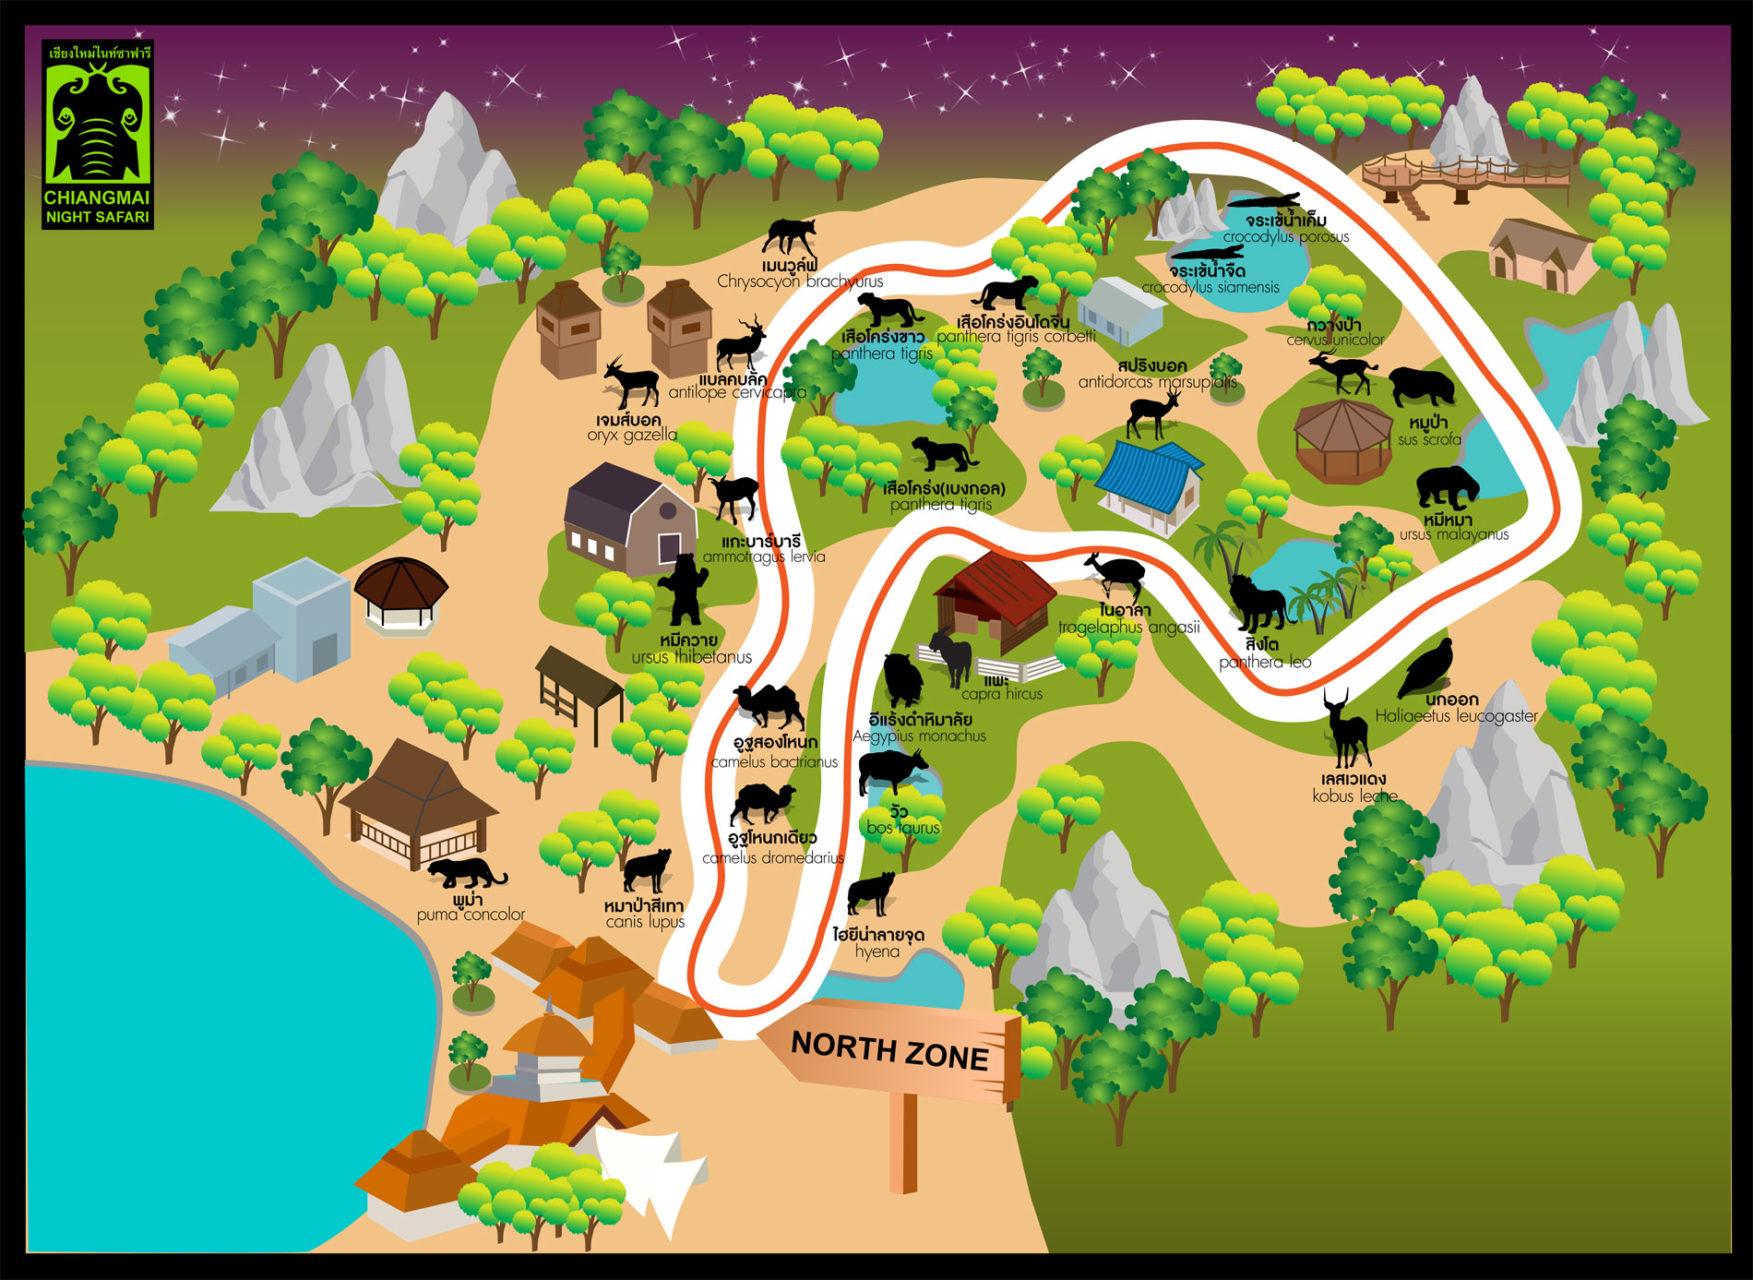 map-nightsafari-north